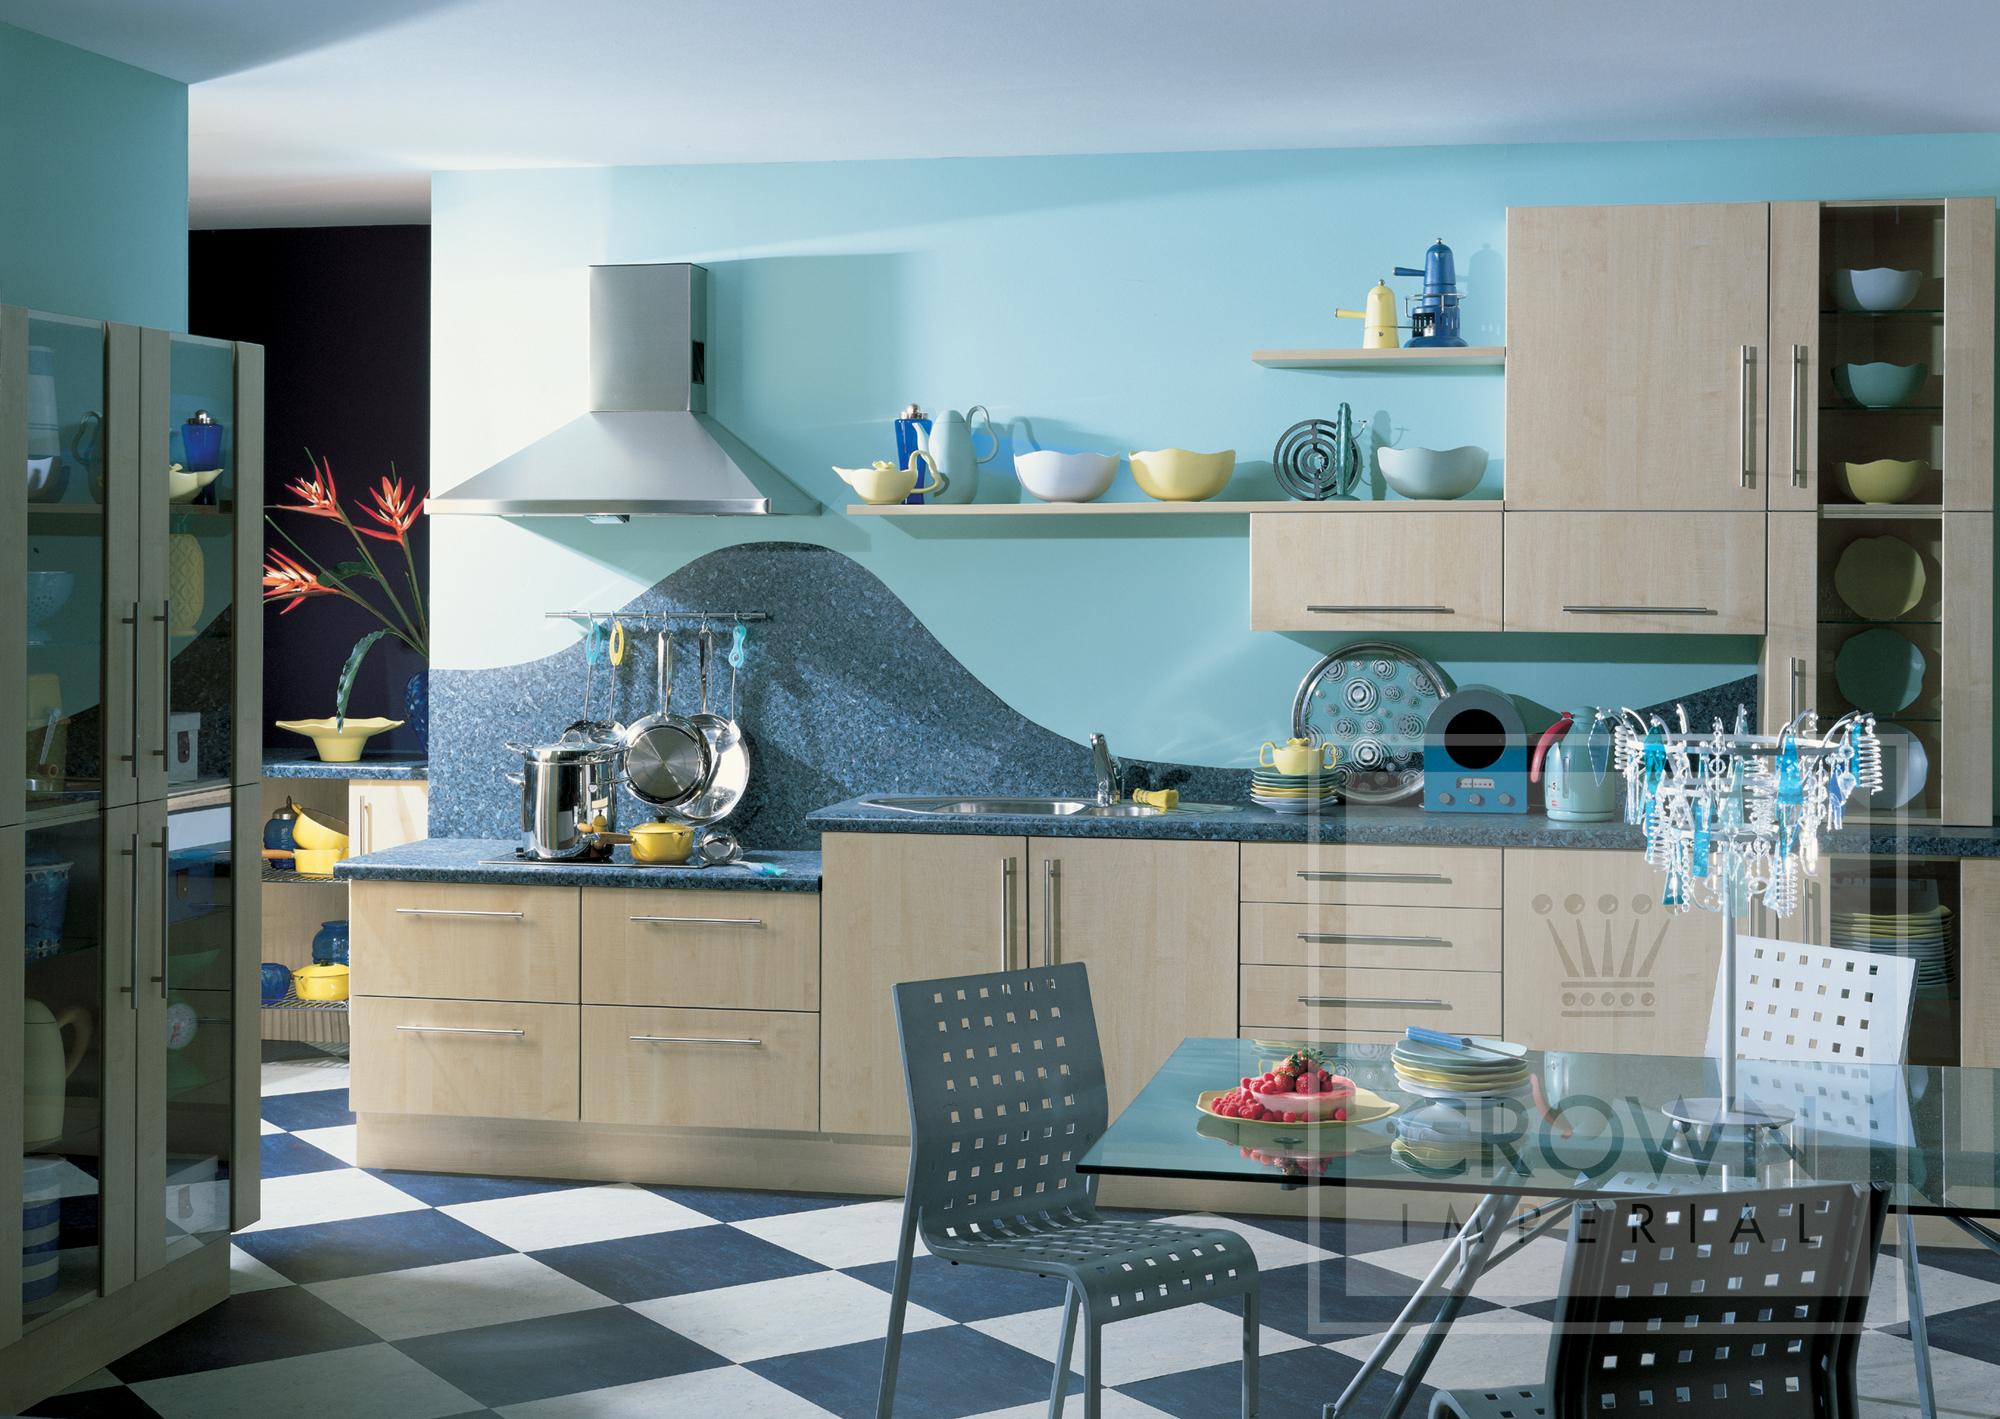 Lifestyle Designs - The Skipton Kitchen Company | Design ...